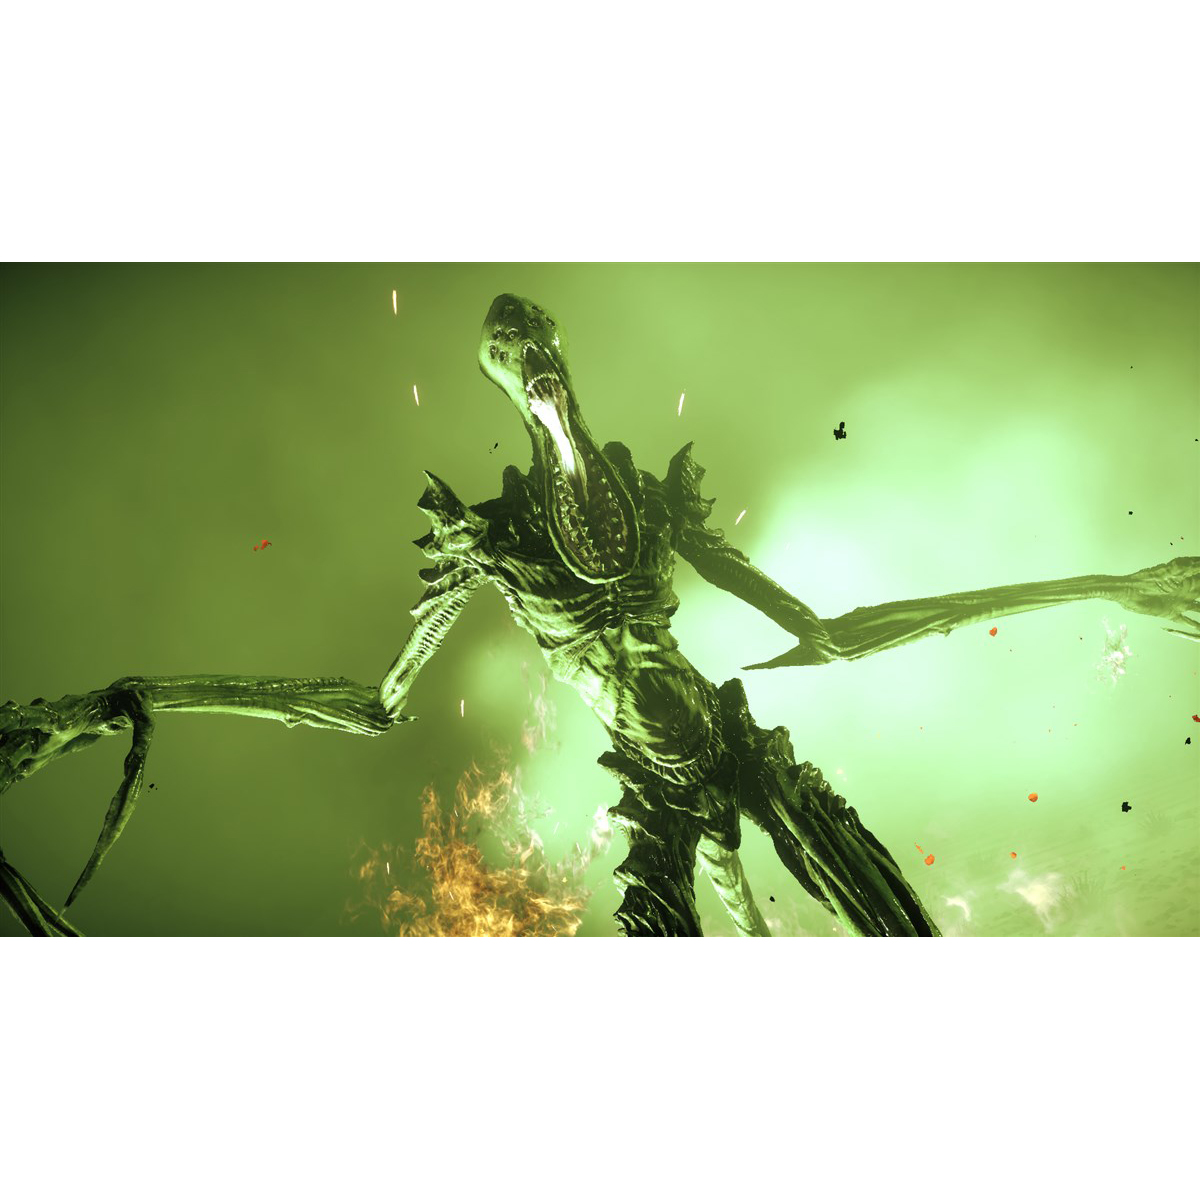 Joc Dragon Age: Inquisition pentru PlayStation 3 4